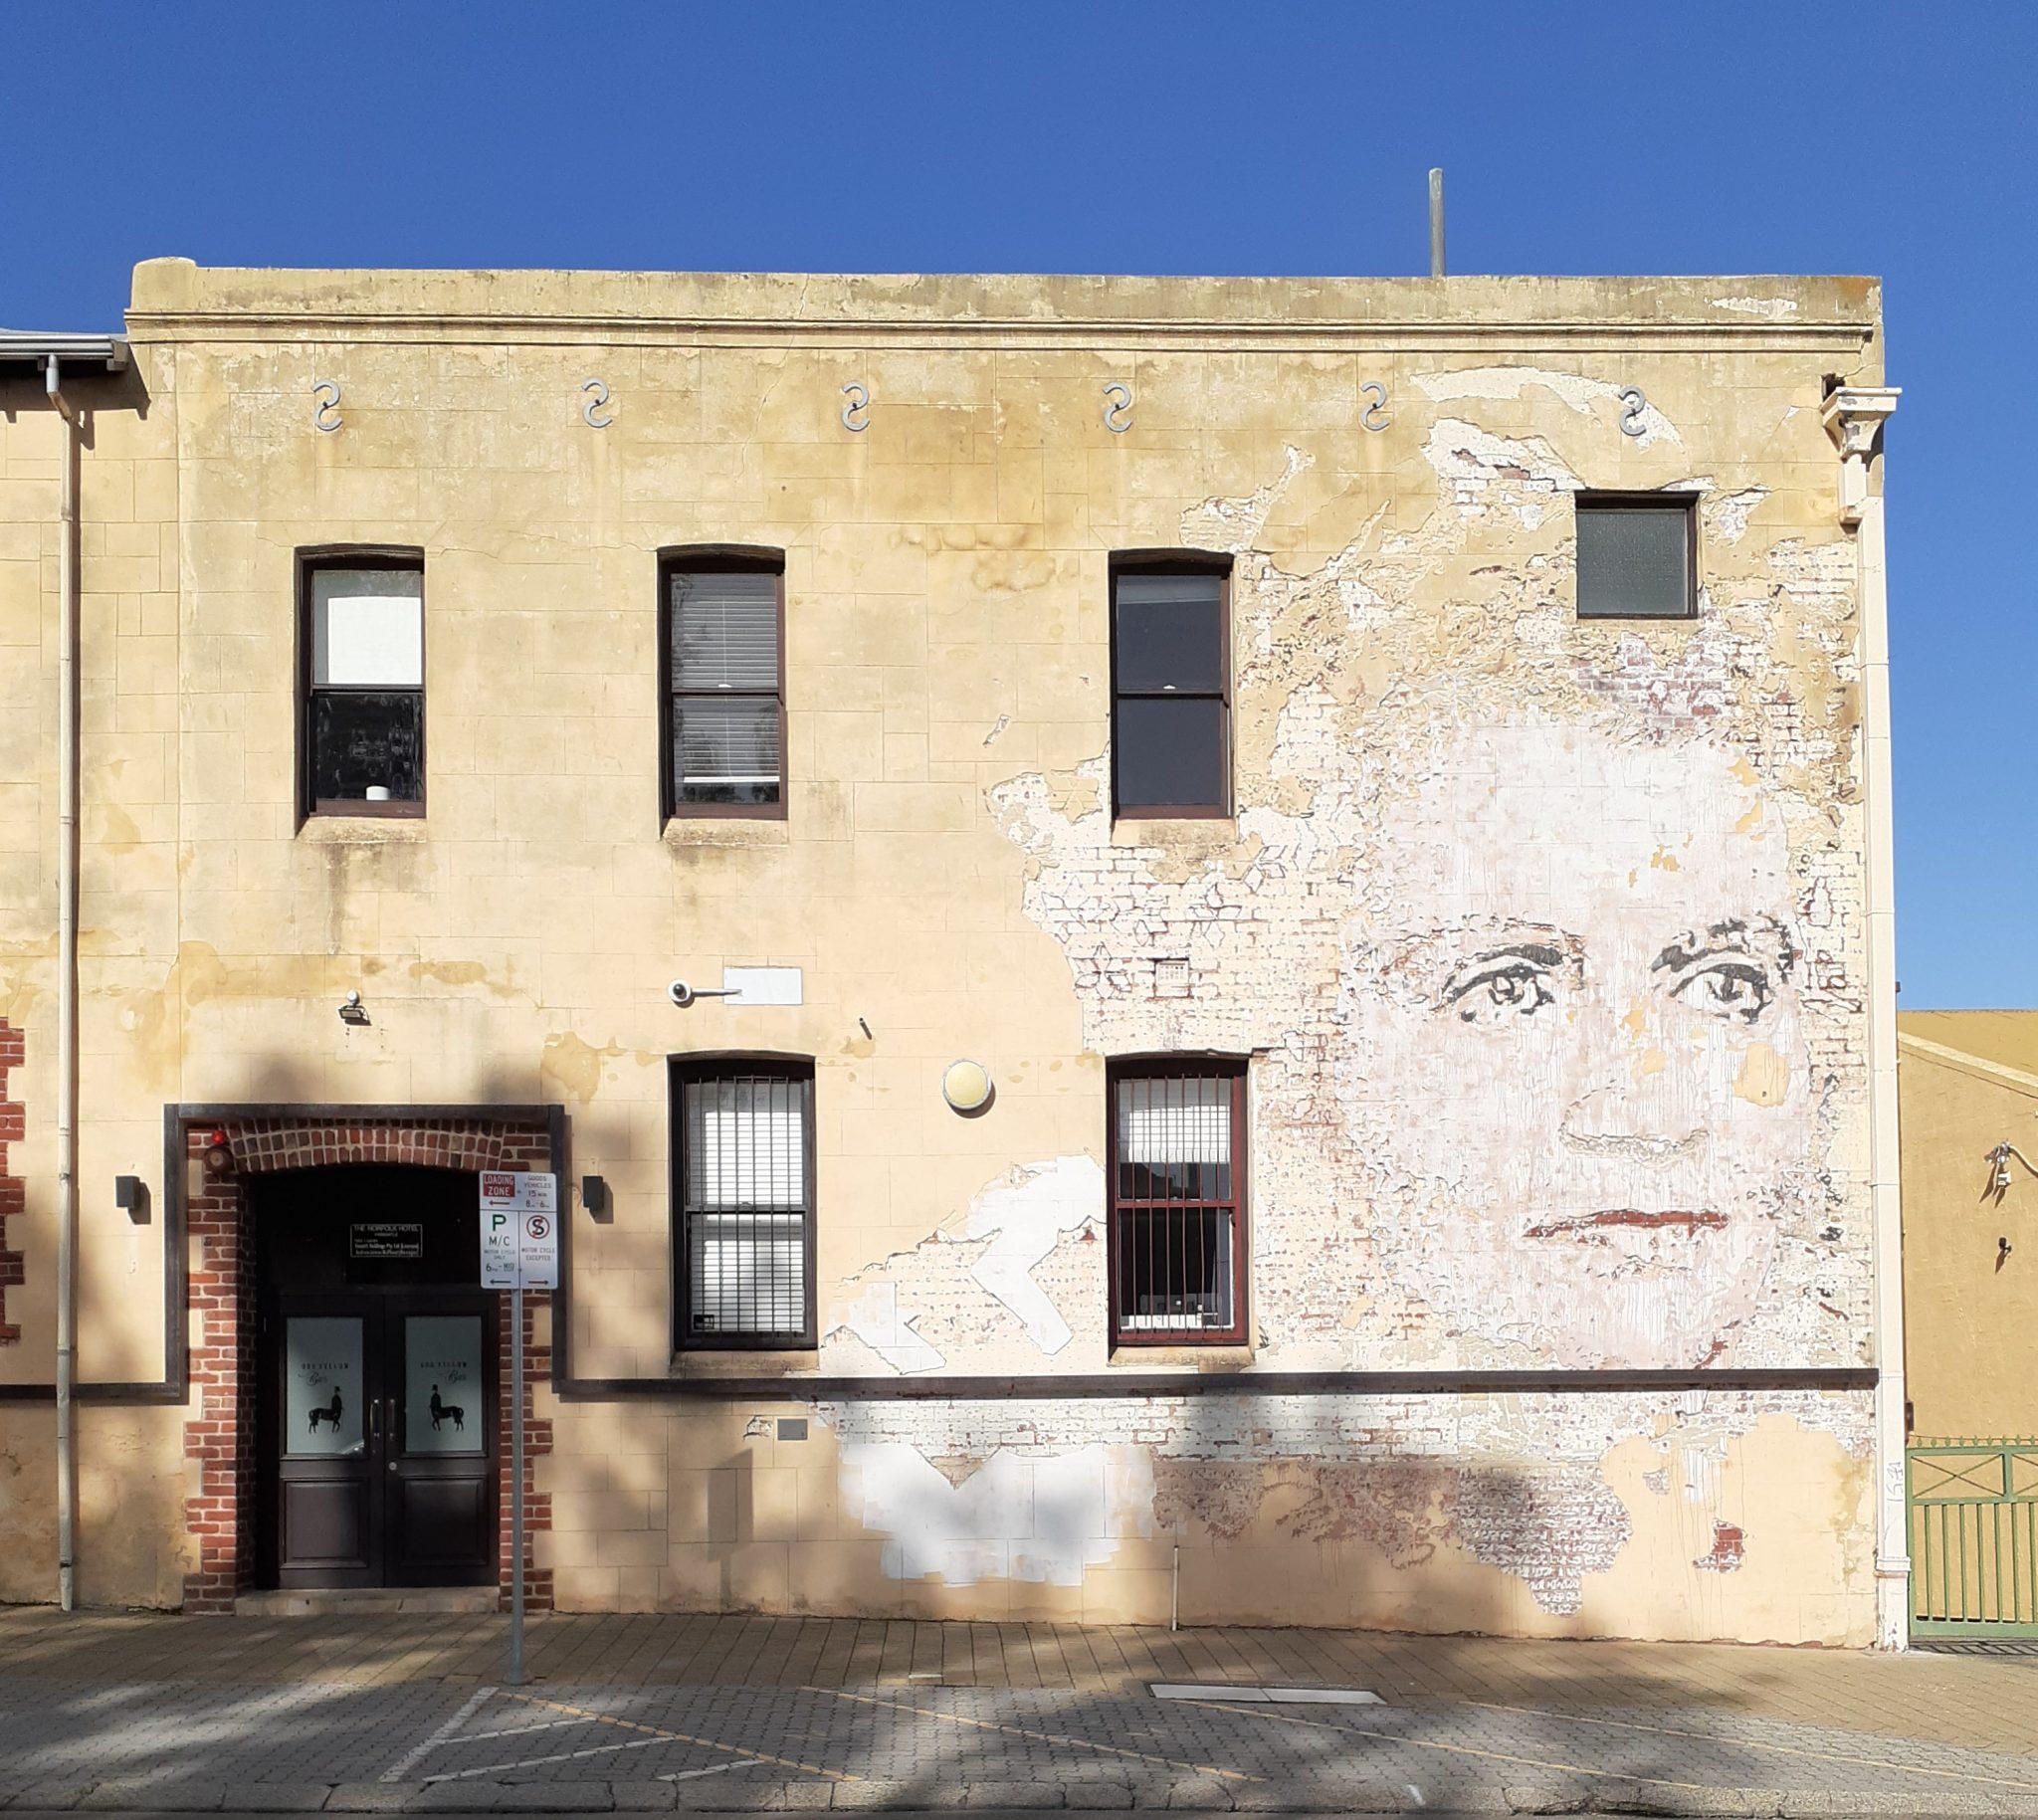 Faces in building facades on Norfolk street Fremantle